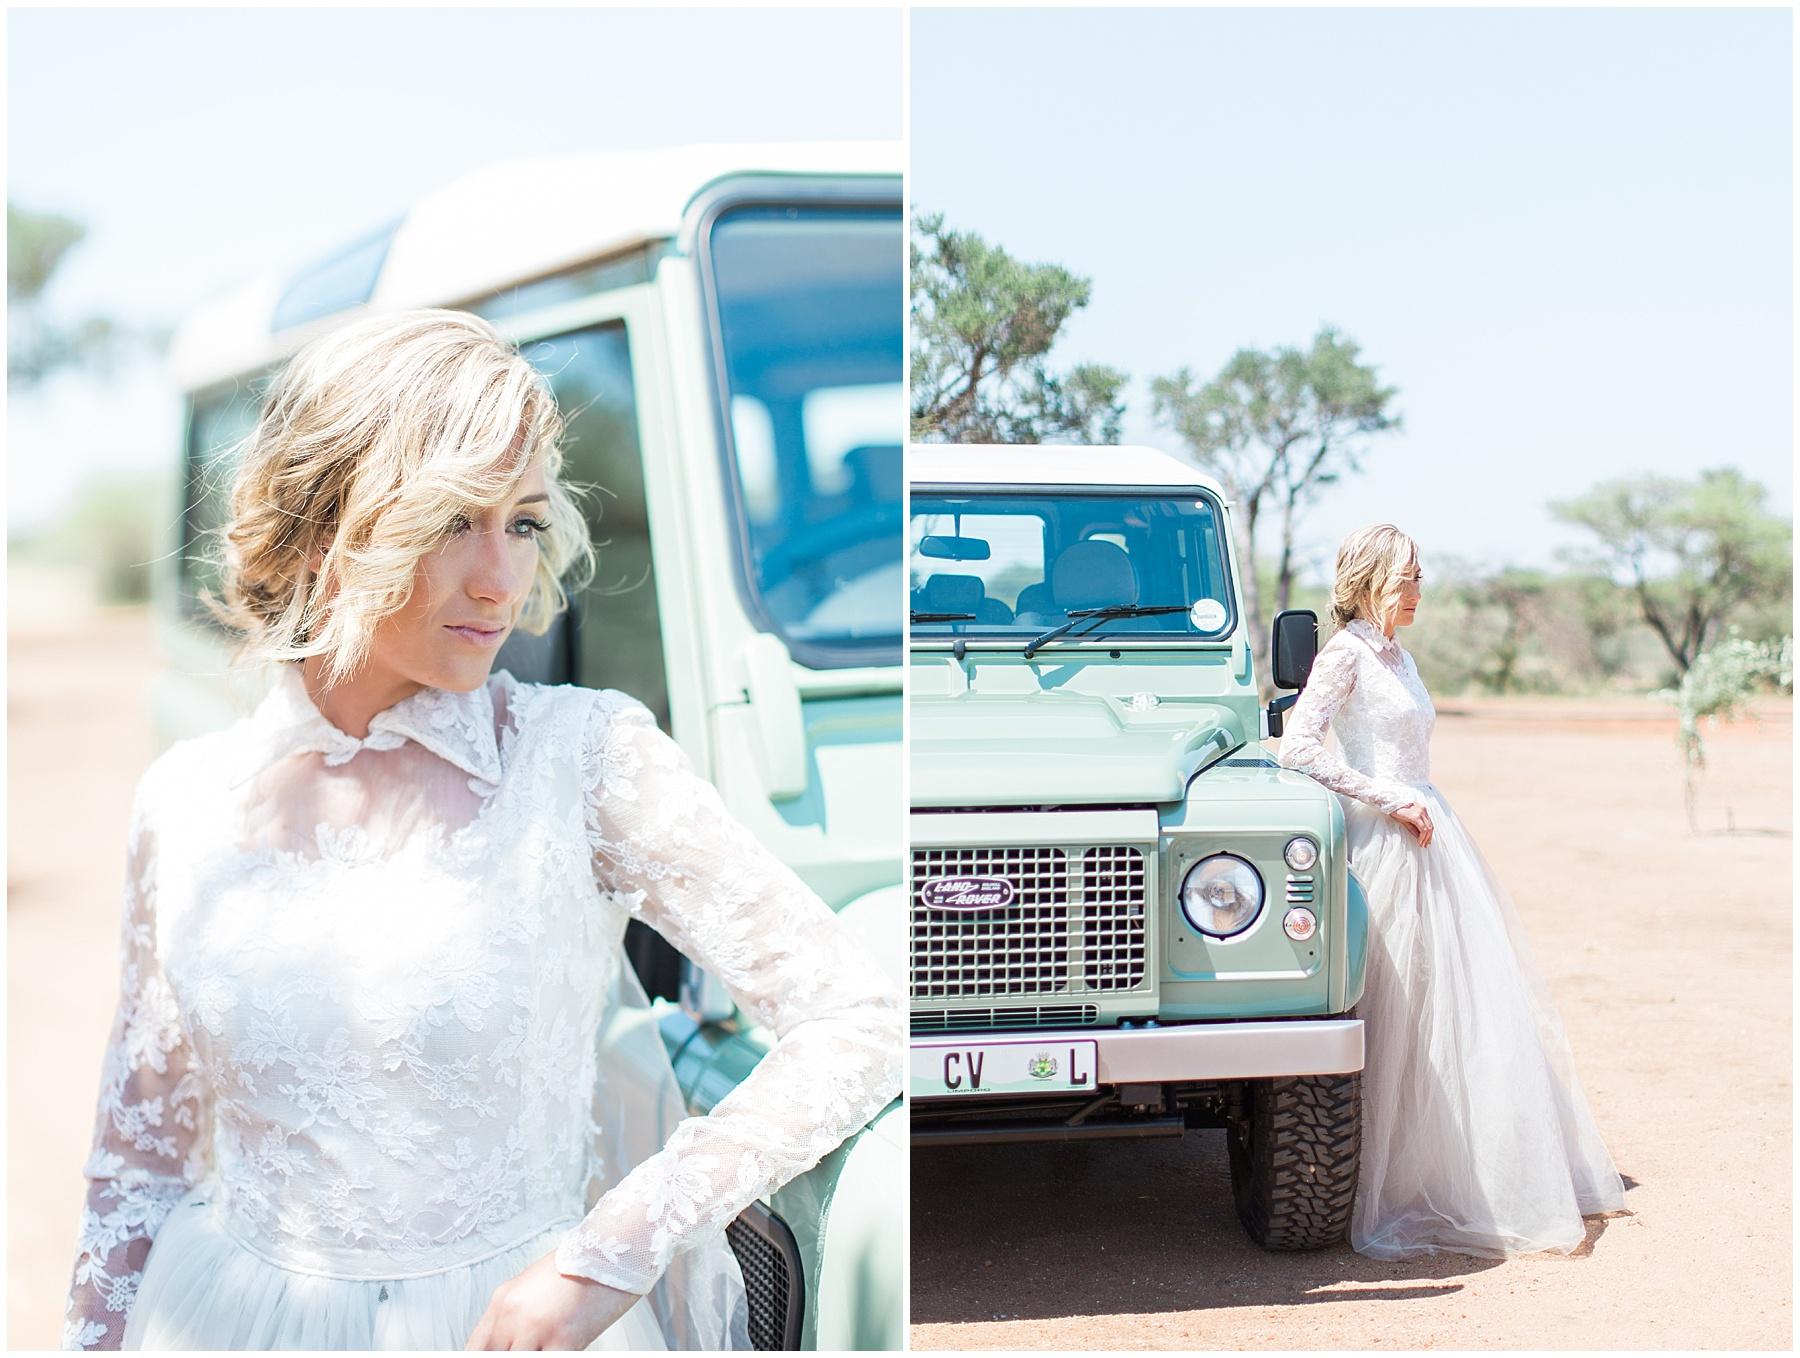 AliciaLandman_JoleneandZander_Wedding_The Pretty Blog_0437.jpg